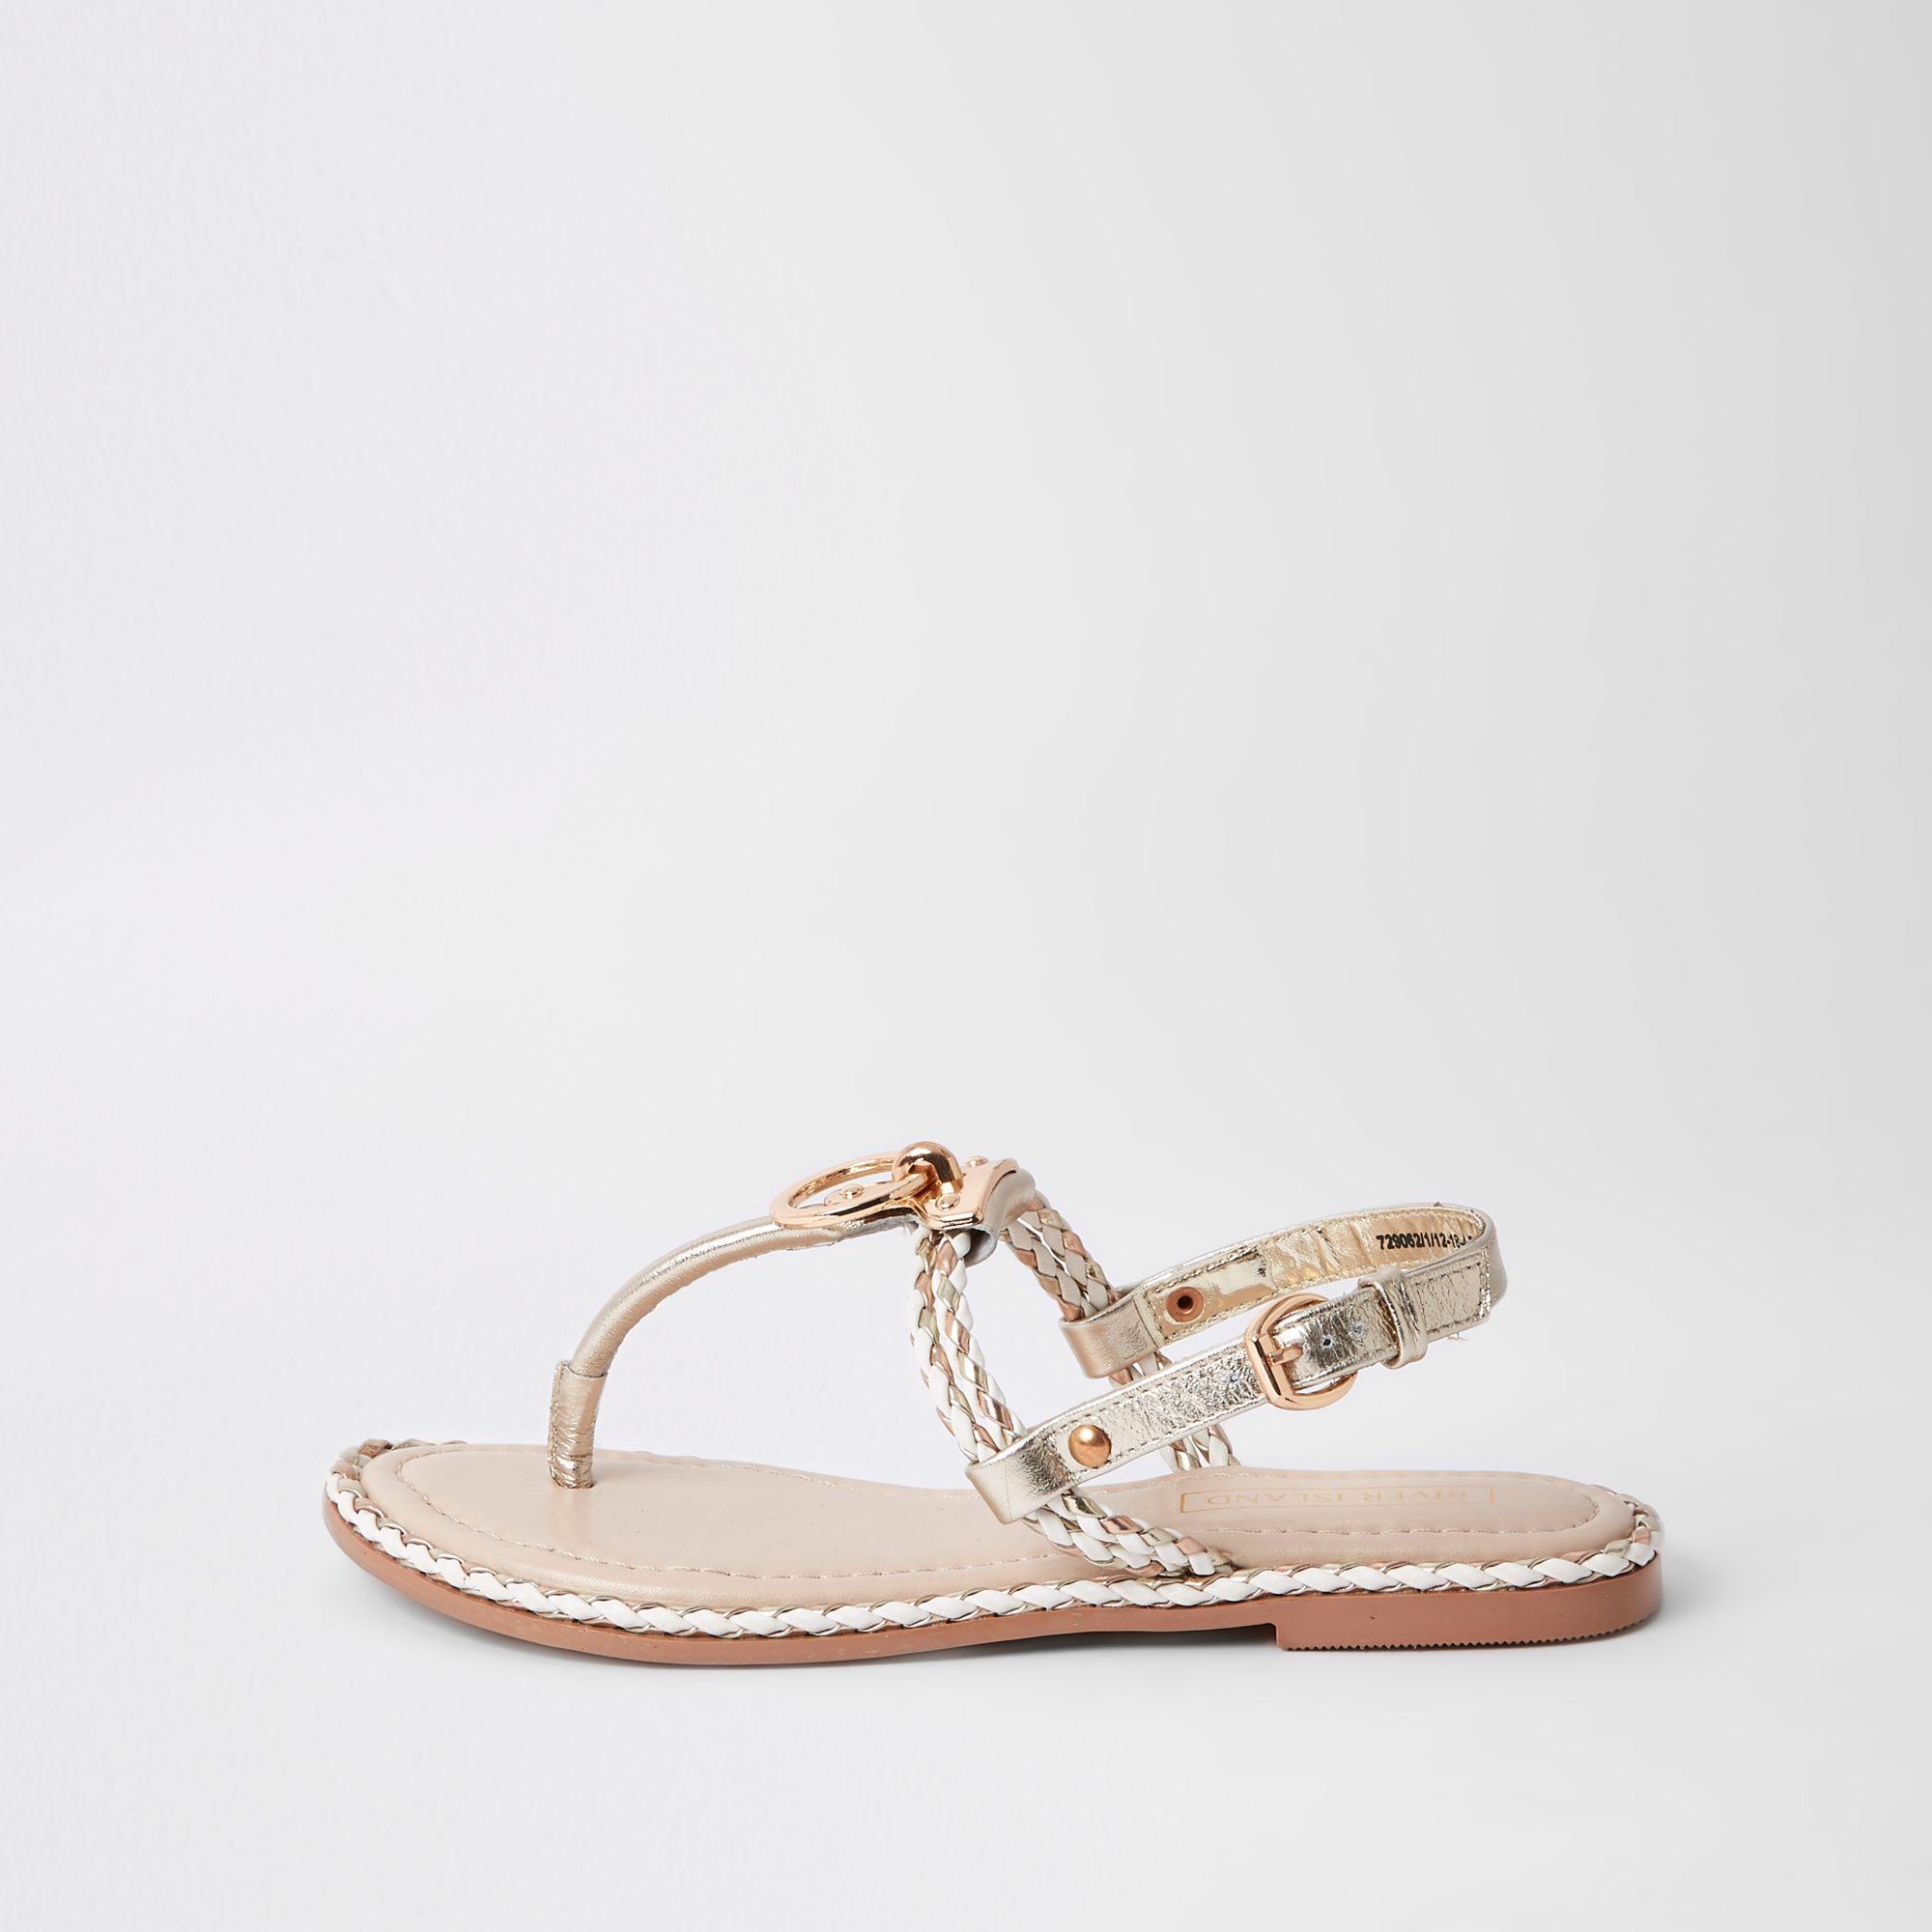 b0cf3ece41d7a Lyst - River Island Light Pink Toe Thong Sandals in Pink